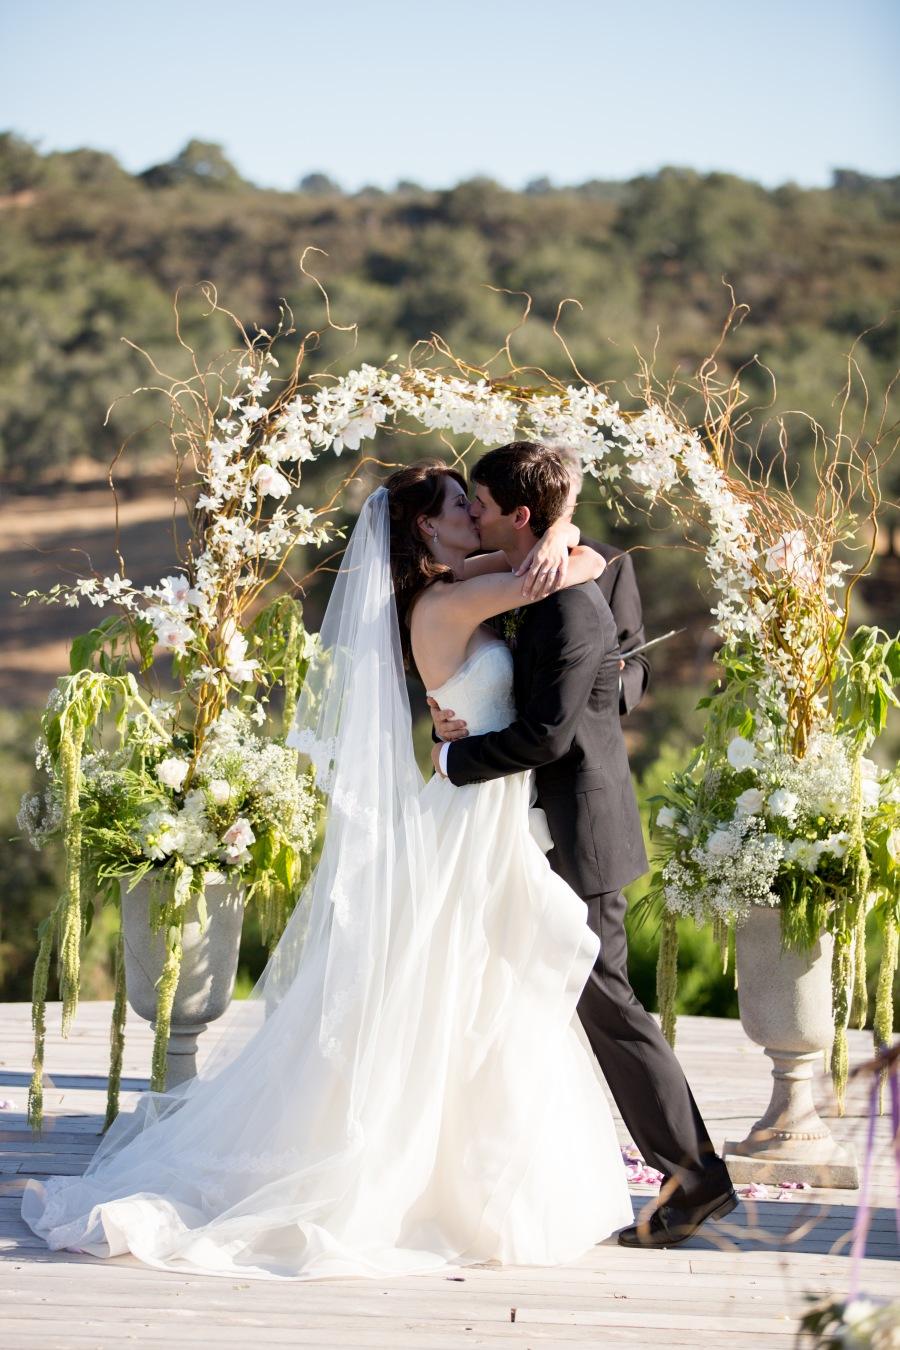 www.santabarbarawedding.com | Soigne Productions | Michael and Anna Costa | Zaca Creek Ranch | Ceremony | The Kiss